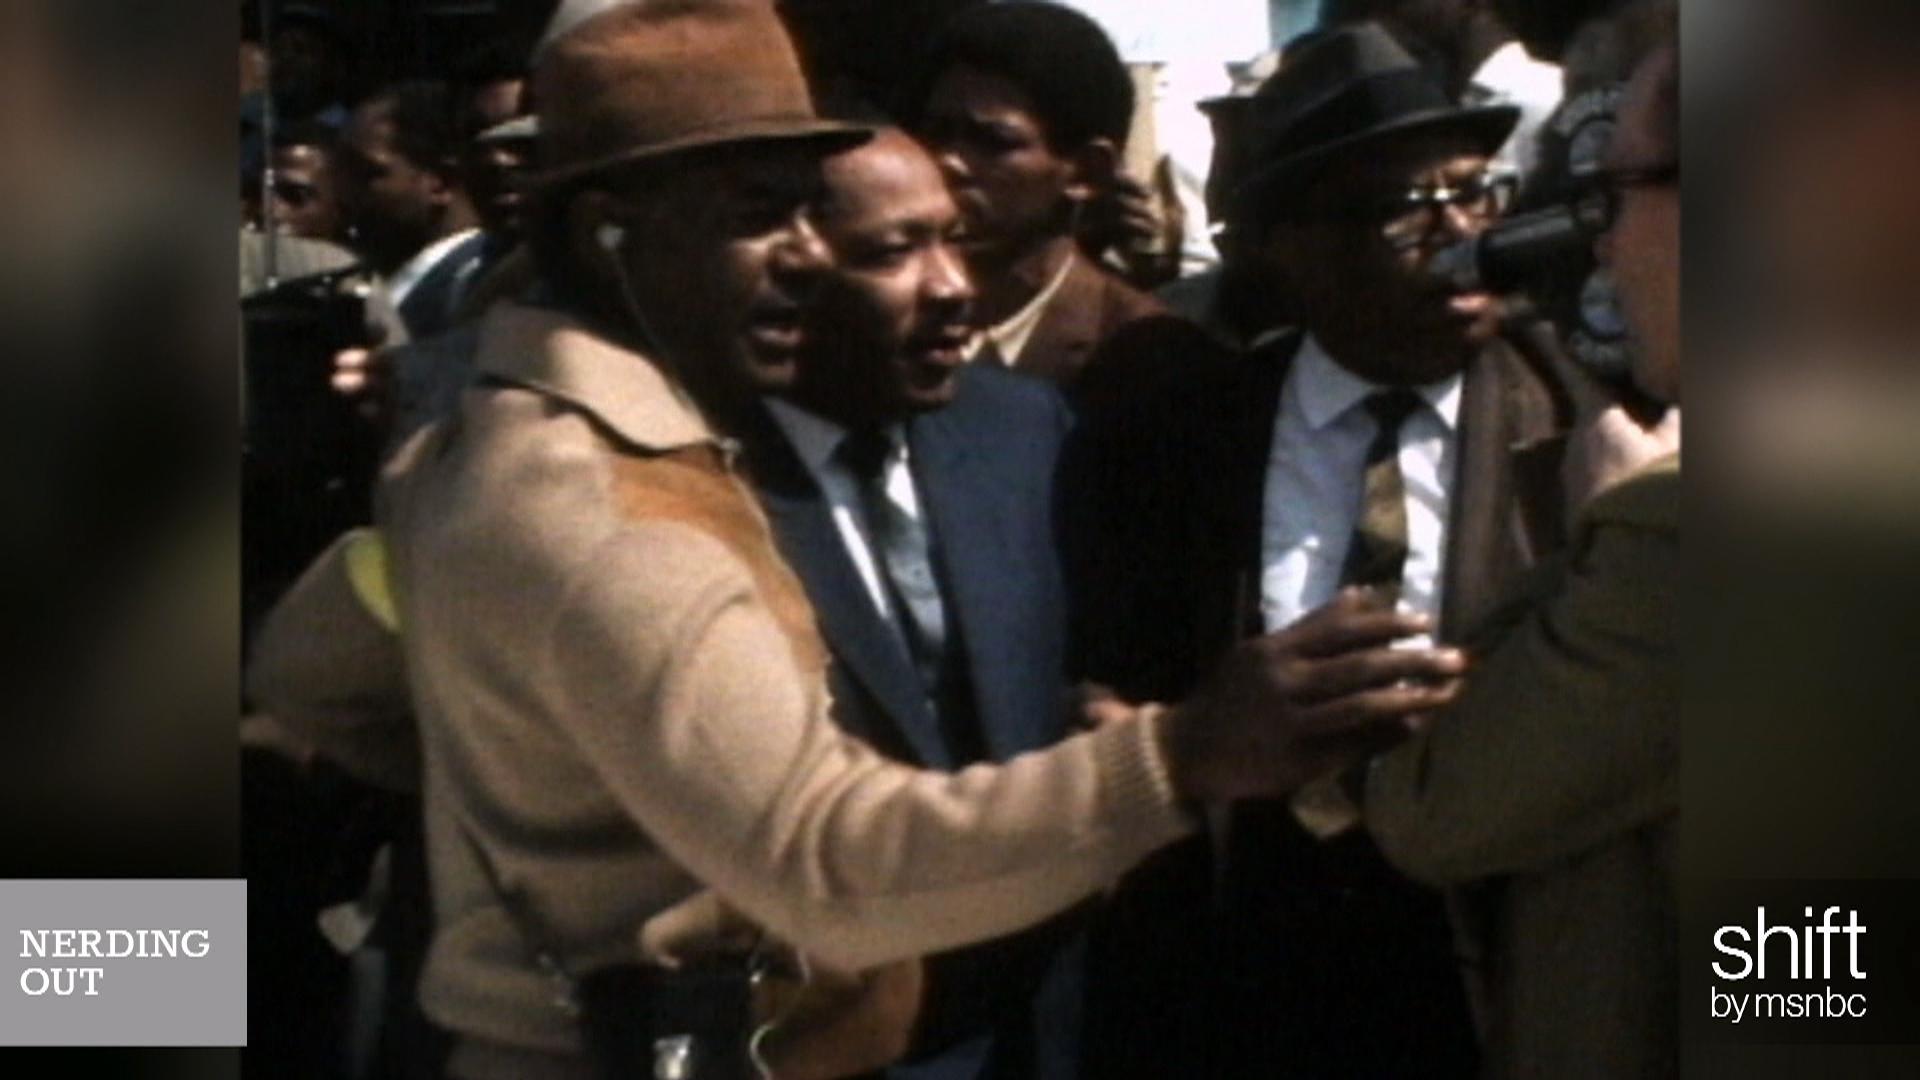 Deconstructing the image of MLK, Jr.